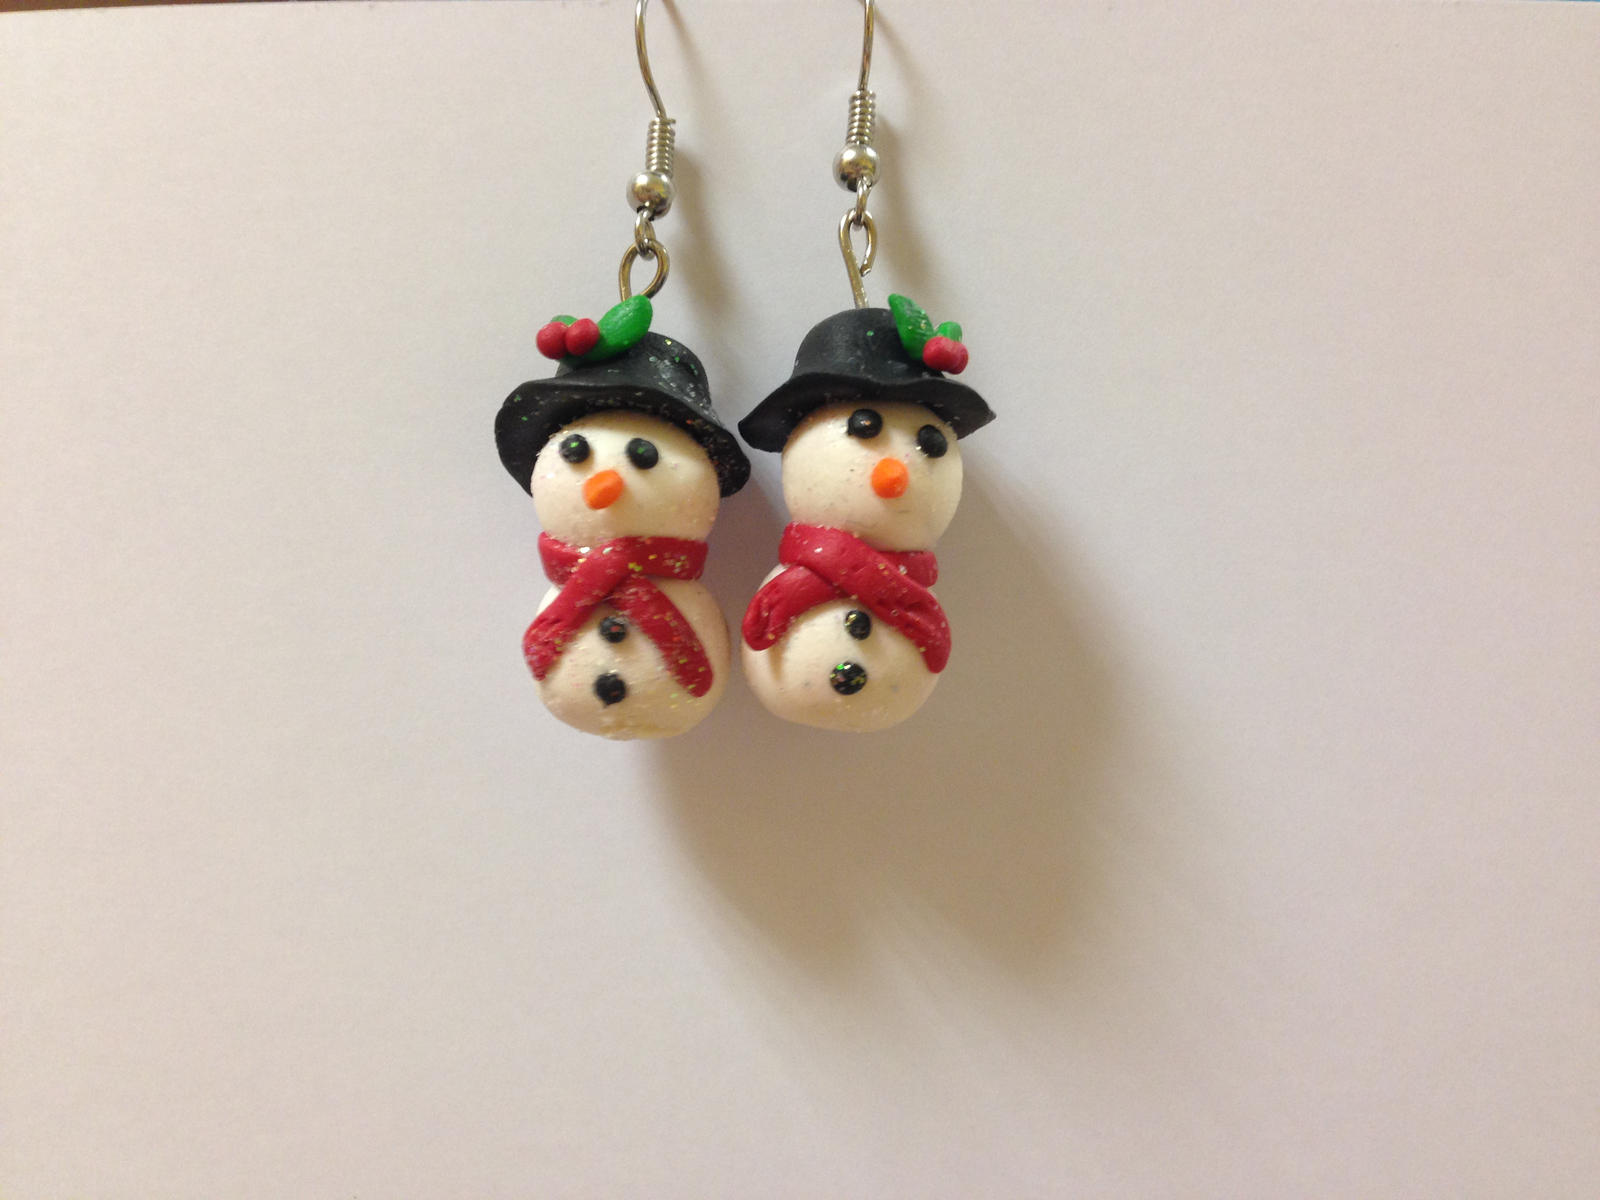 Handmade christmas earrings by aisling corcra on deviantart